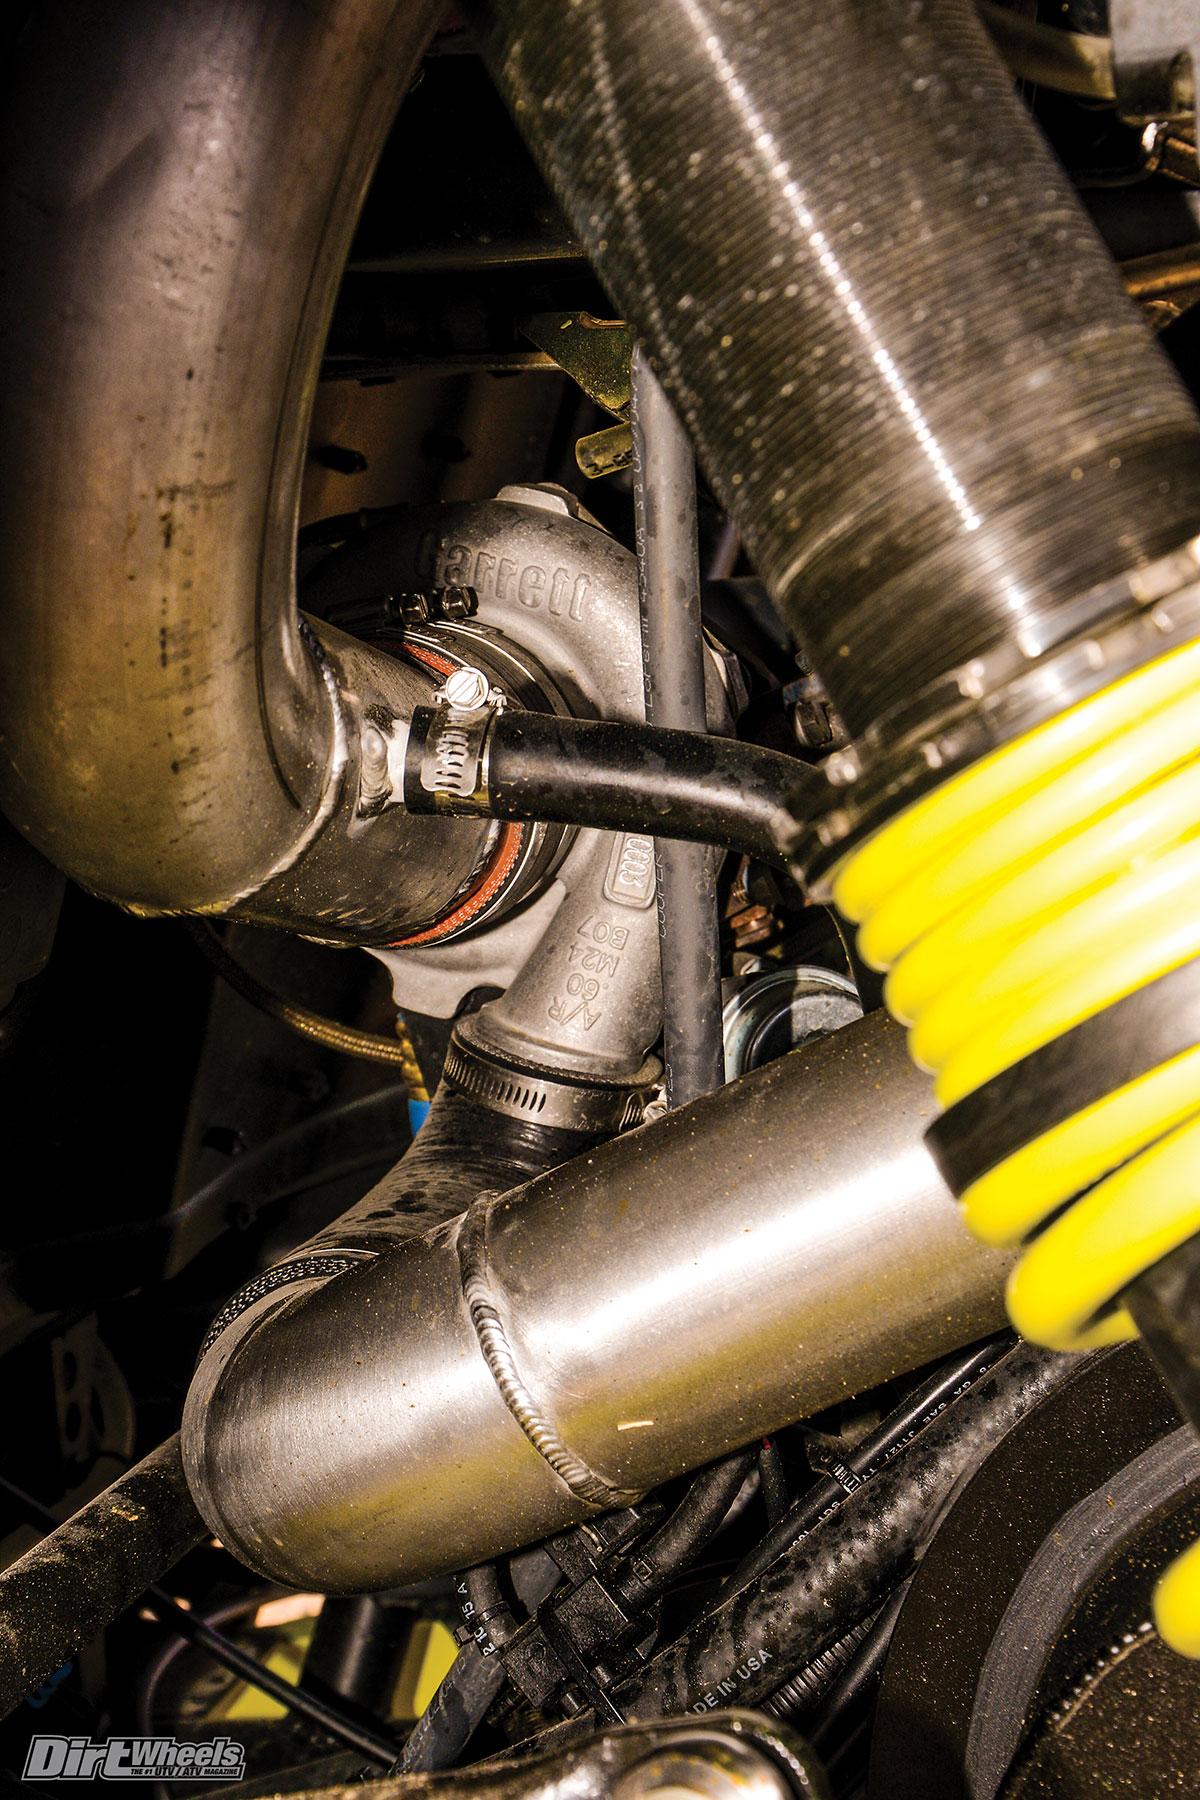 PROJECT UTV: FMX LEGEND RONNIE RENNER'S 200-HP RZR | Dirt Wheels